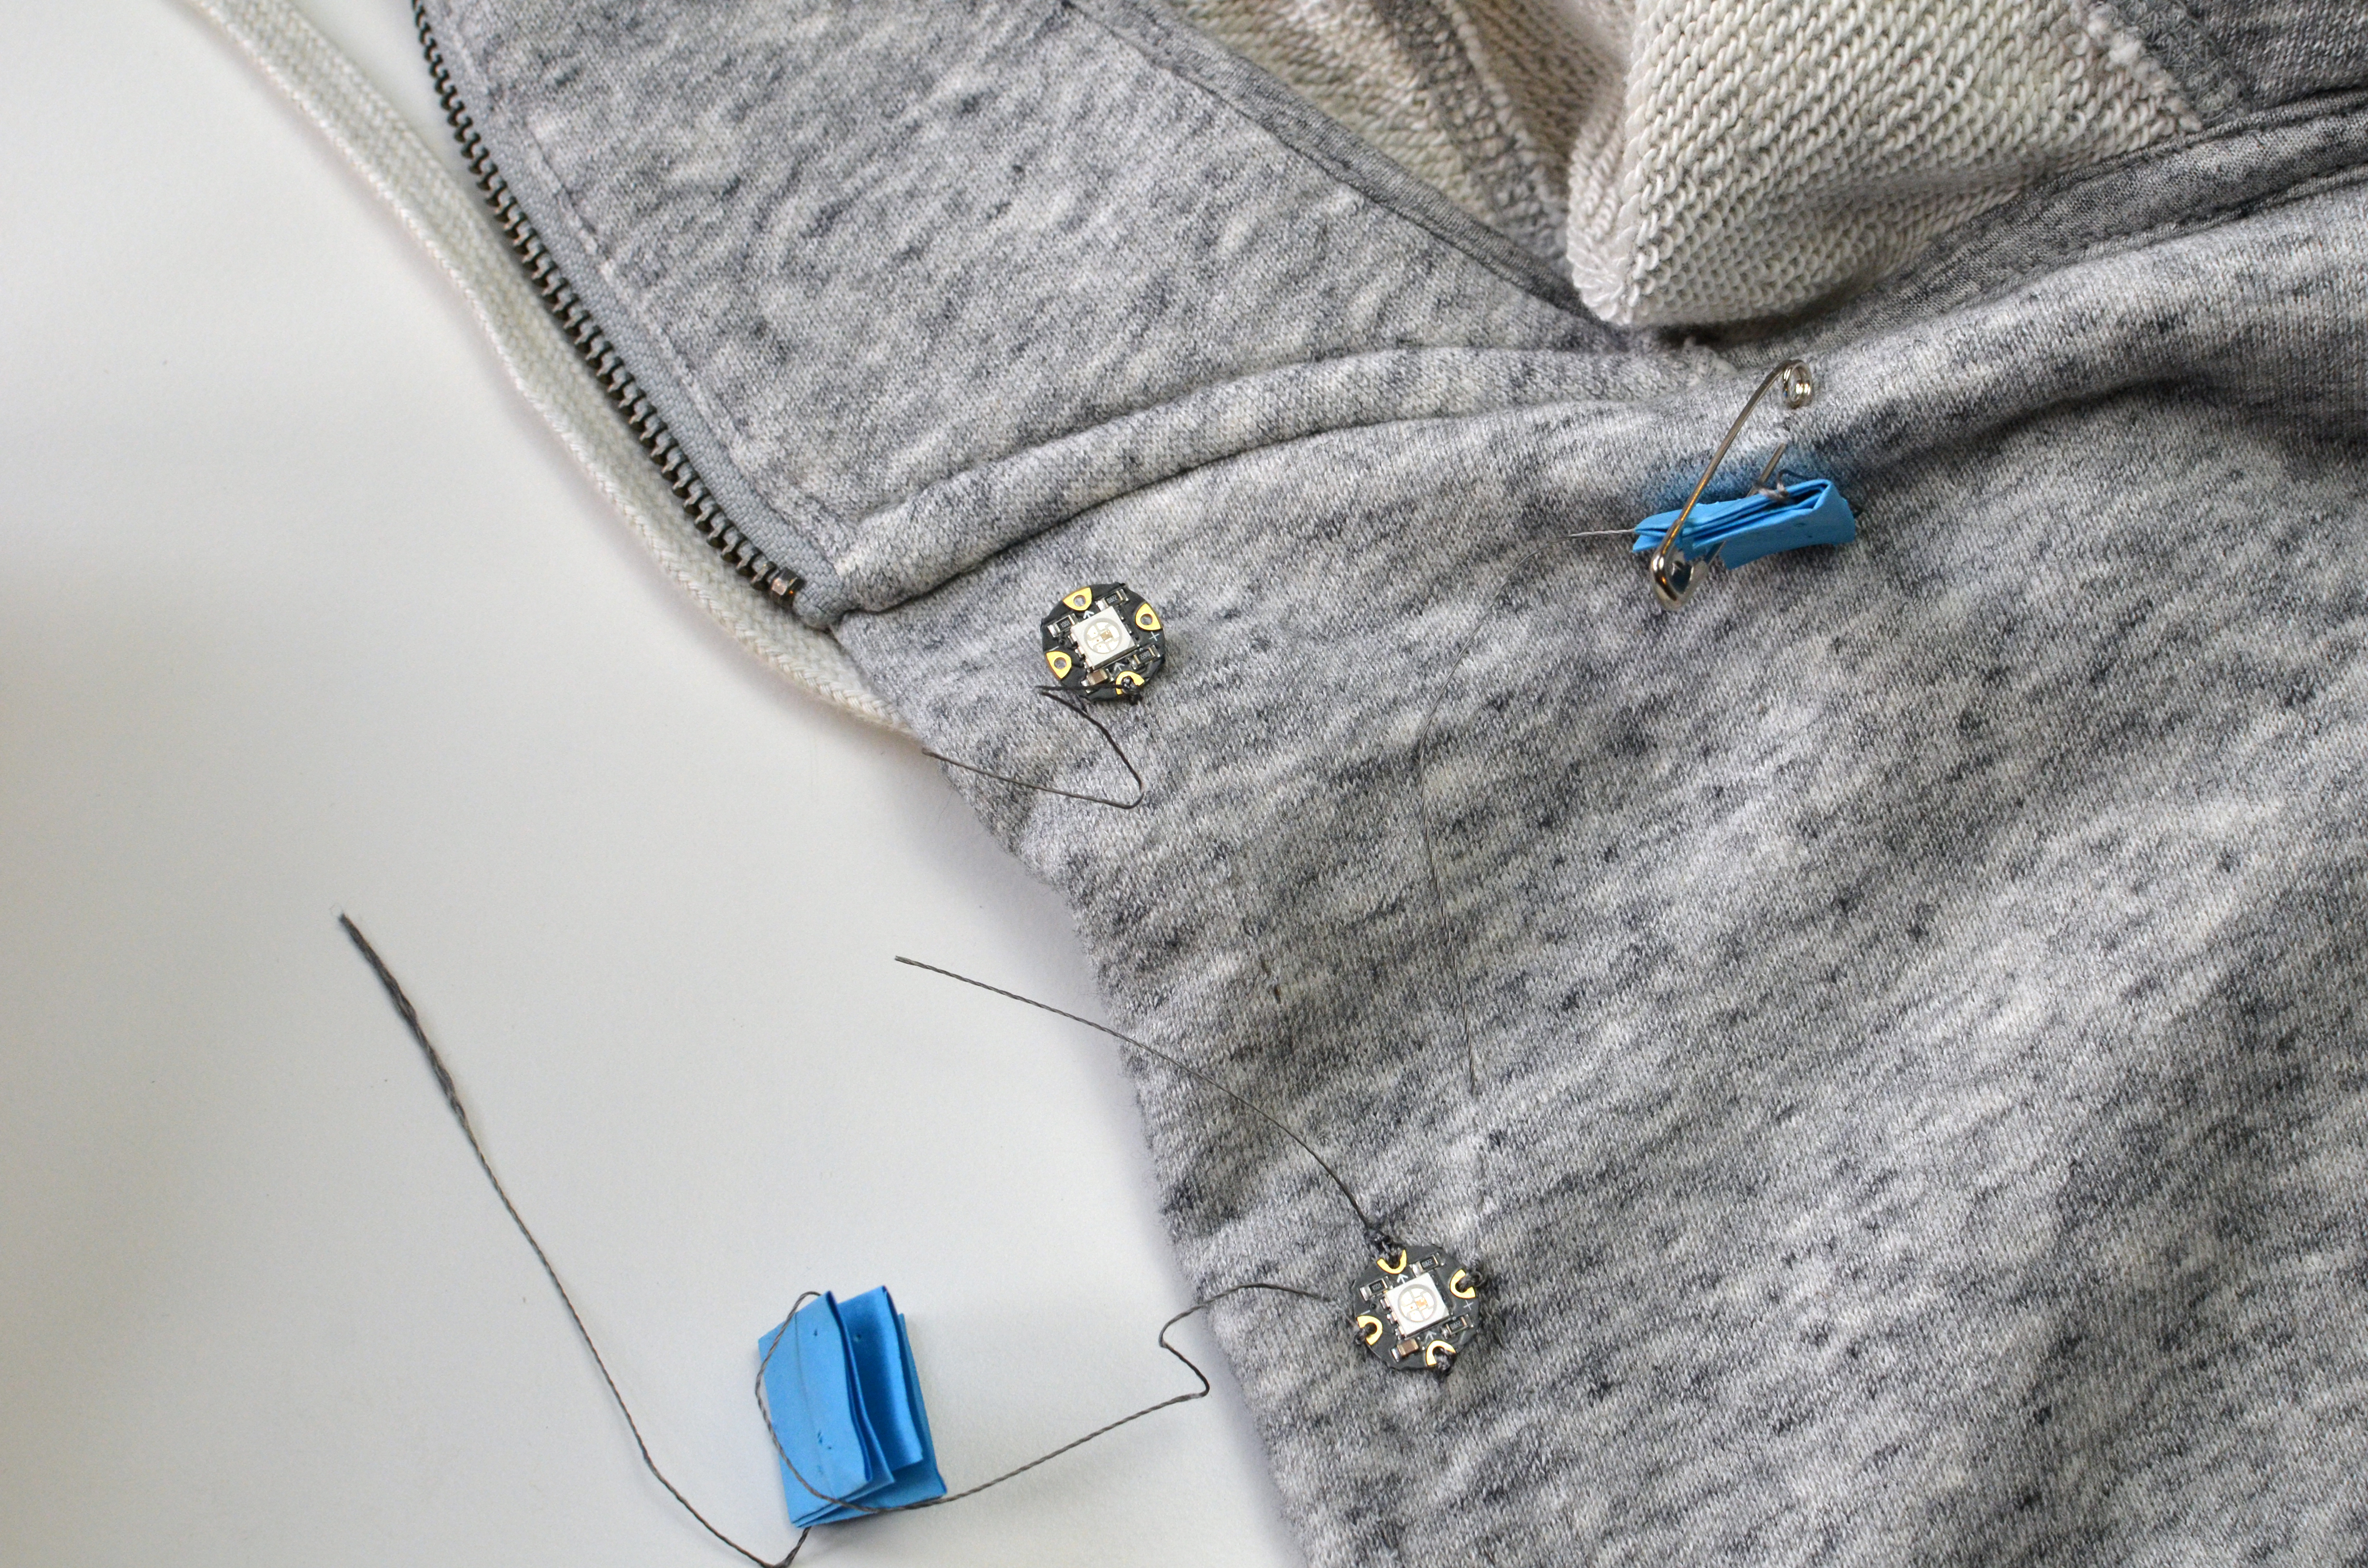 sensors_textile-potentiometer-hoodie-04.jpg